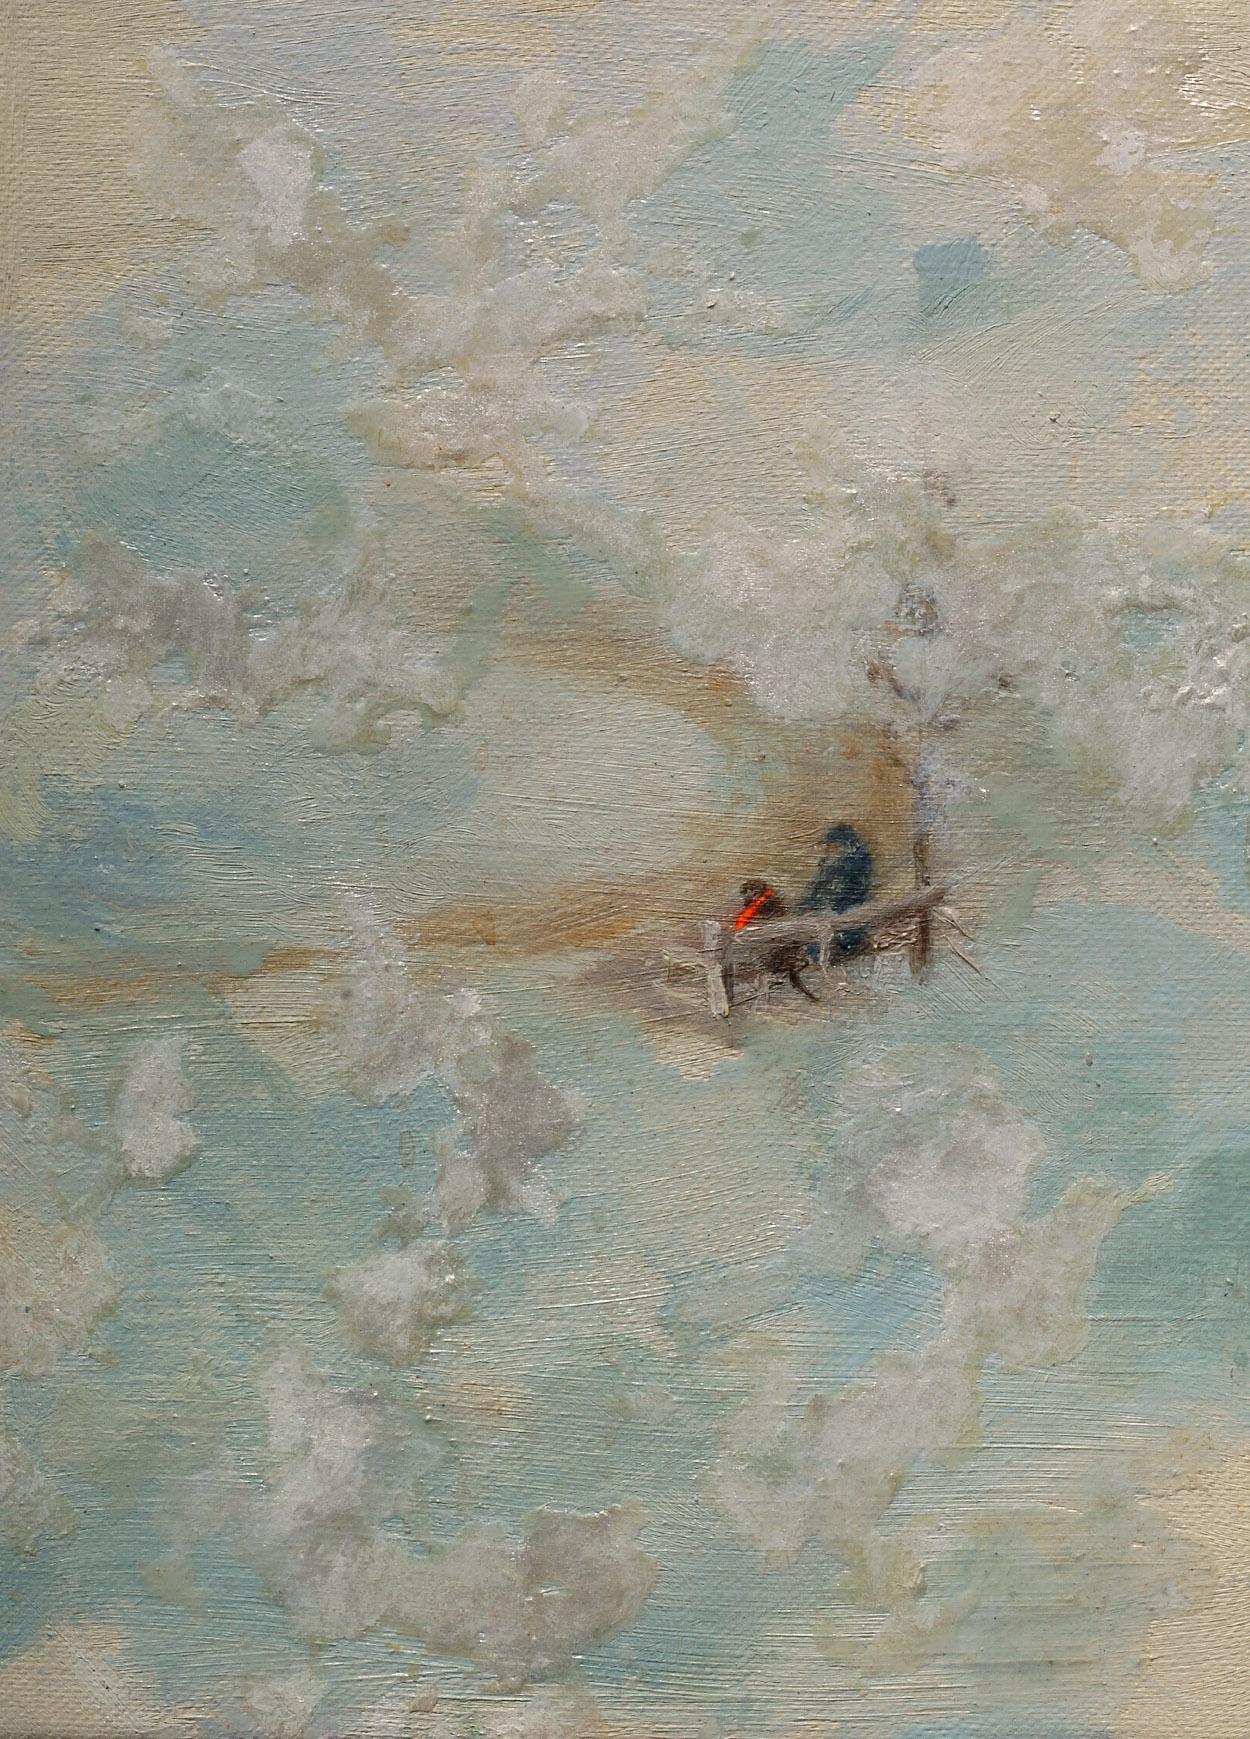 Ámsterdam 2004   Oil paint, fluorescent and pigment on canvas. 16 x 22 cm.